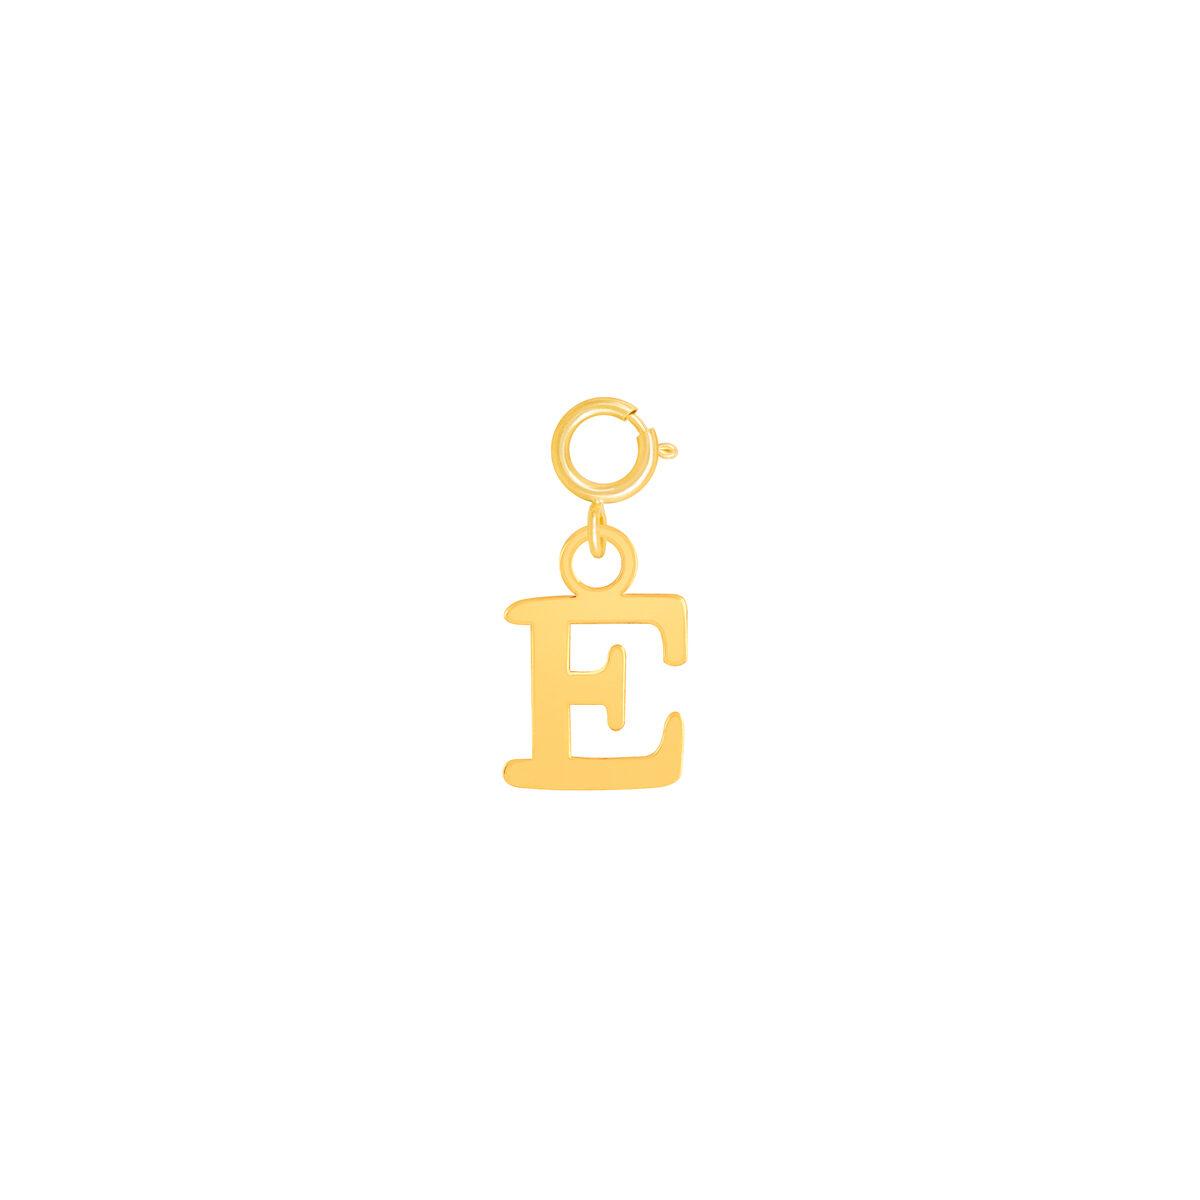 آویز طلا حرف E